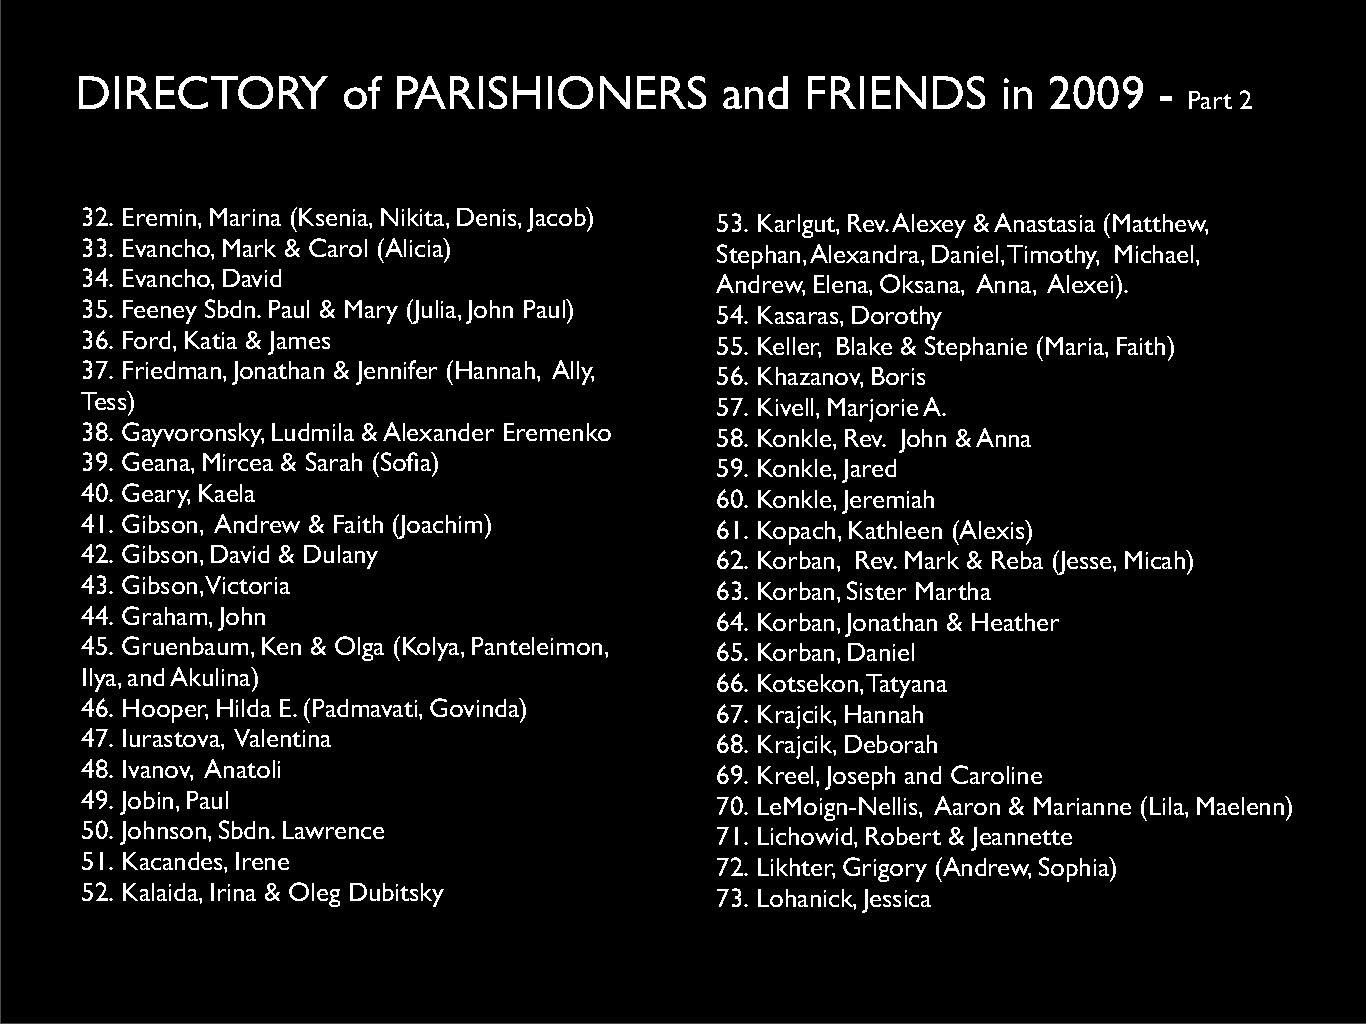 HROC-100-History-of-the-Parish1_Page_150